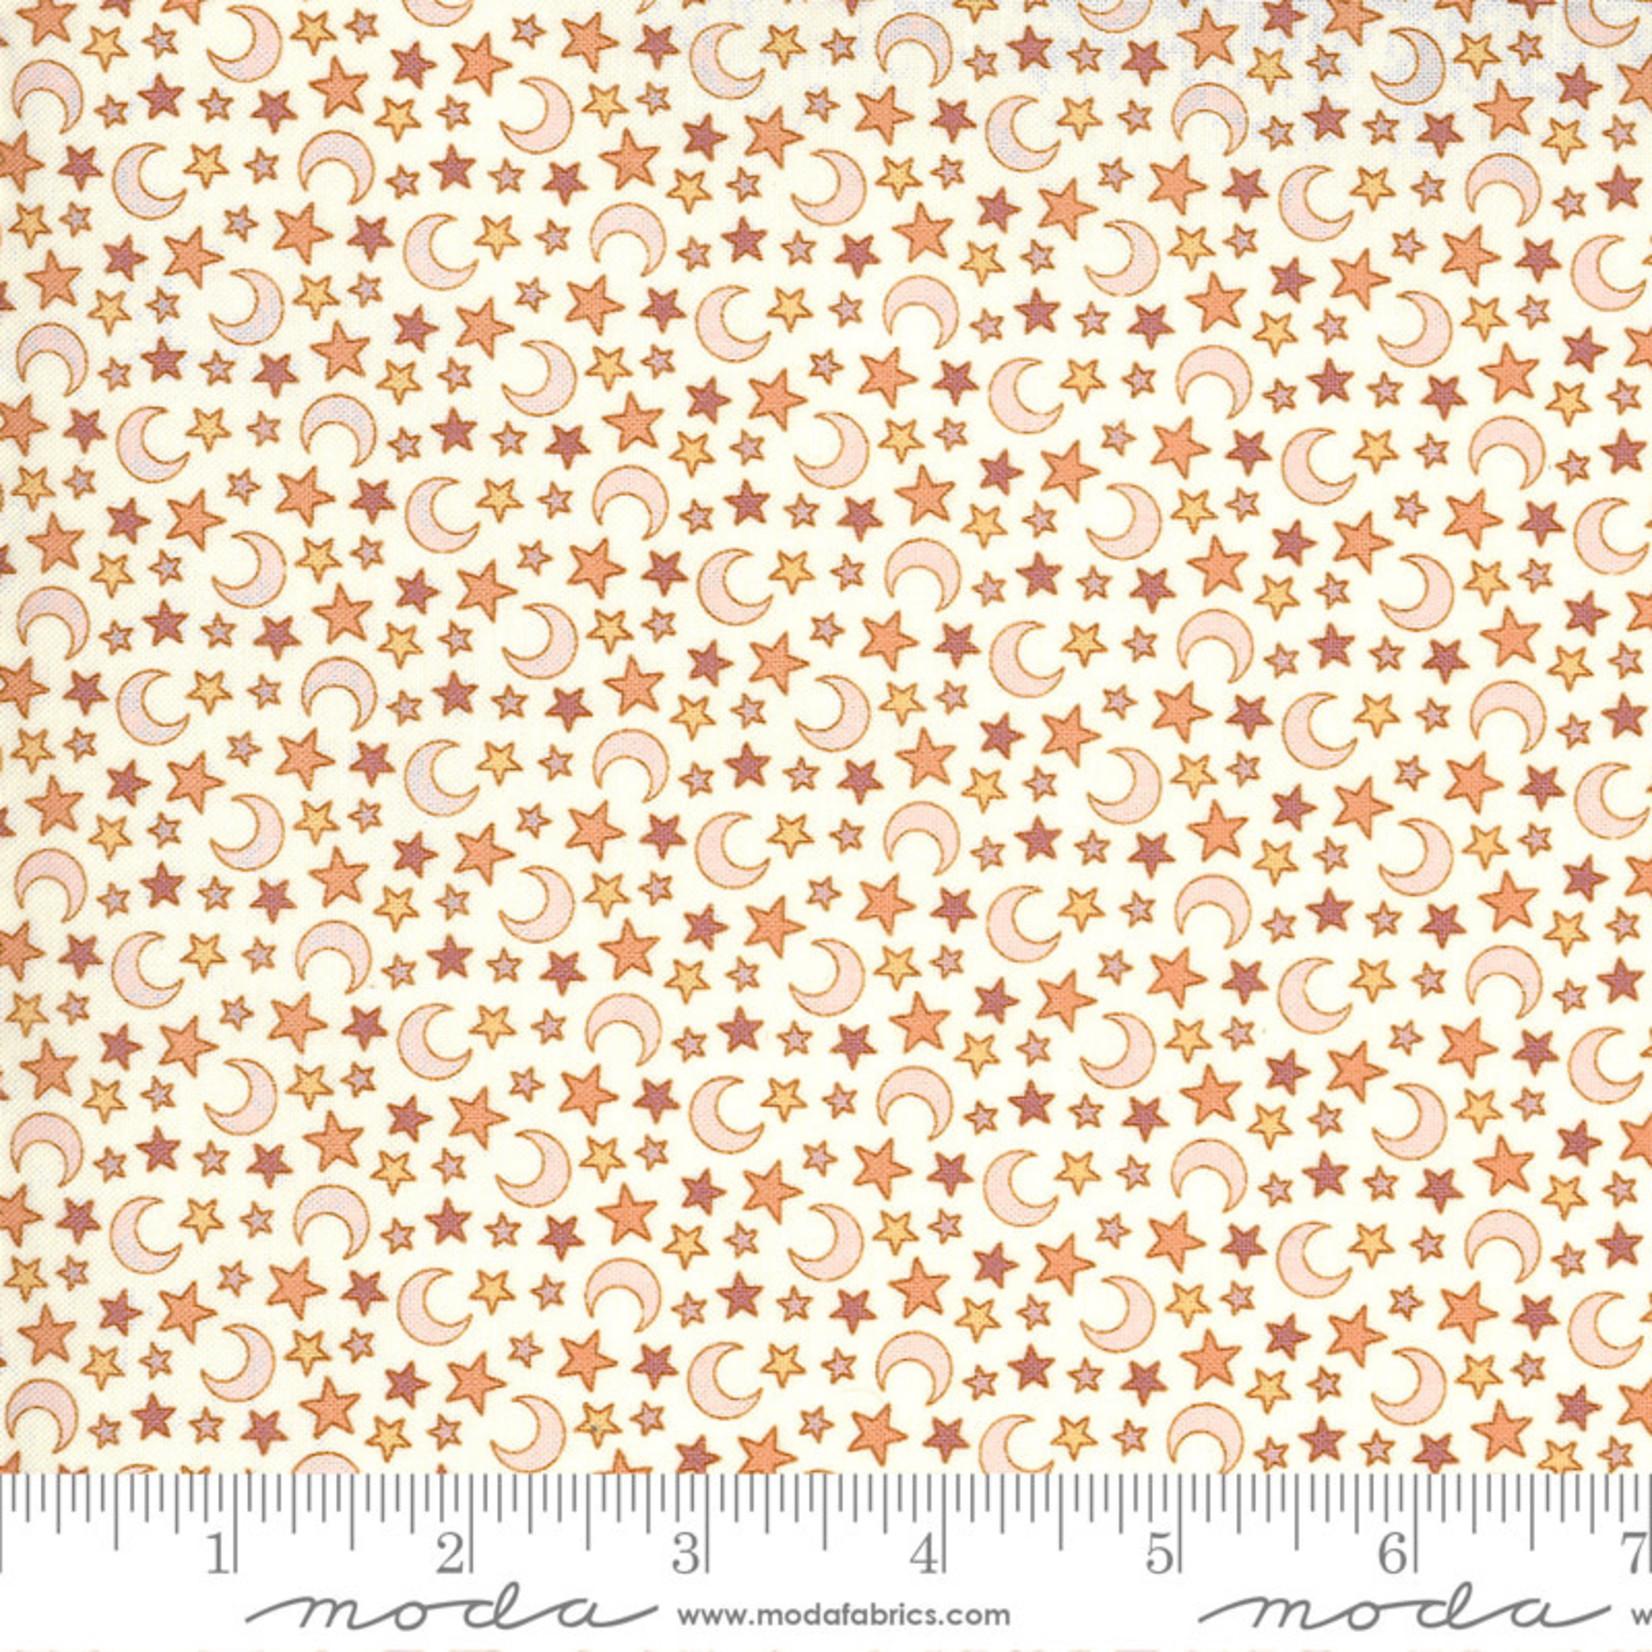 Urban Chiks Kitty Corn, Magic Dust, Ghost 31173-11 $0.20 per cm or $20/m